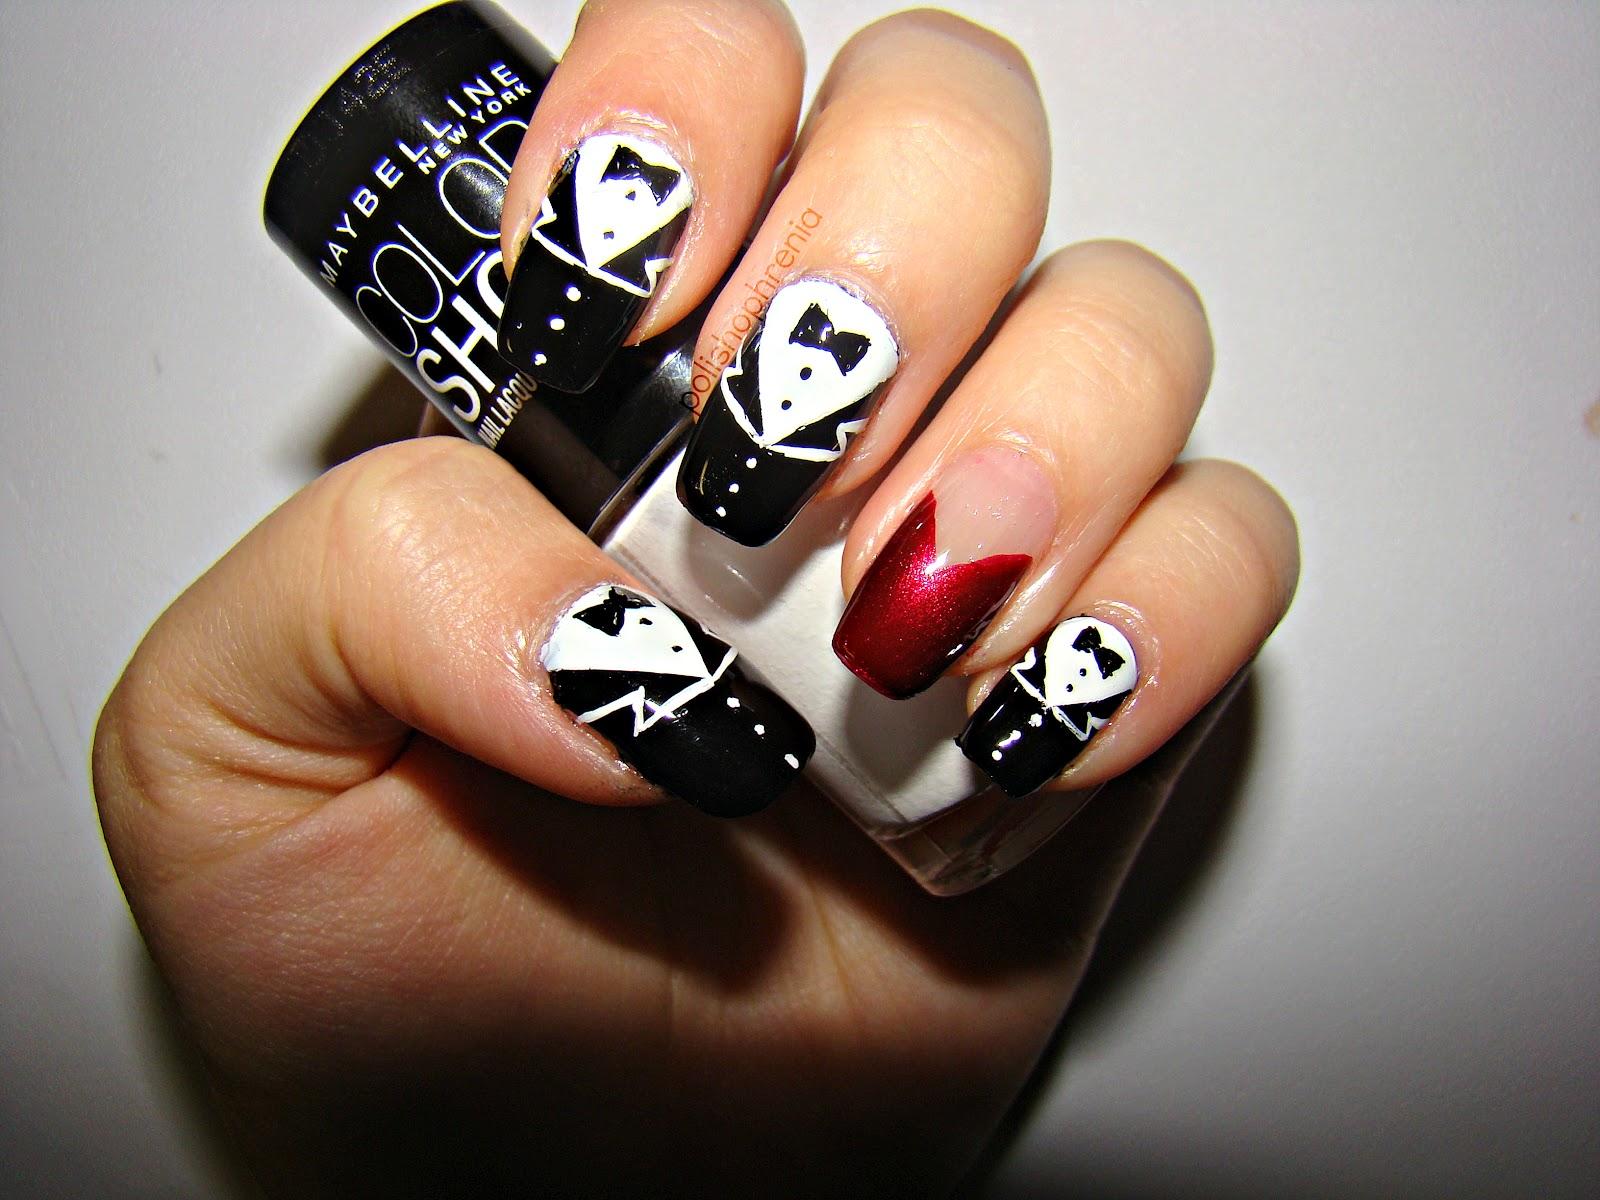 Polishophrenia: Tuxedo Nails with a red dress accent.